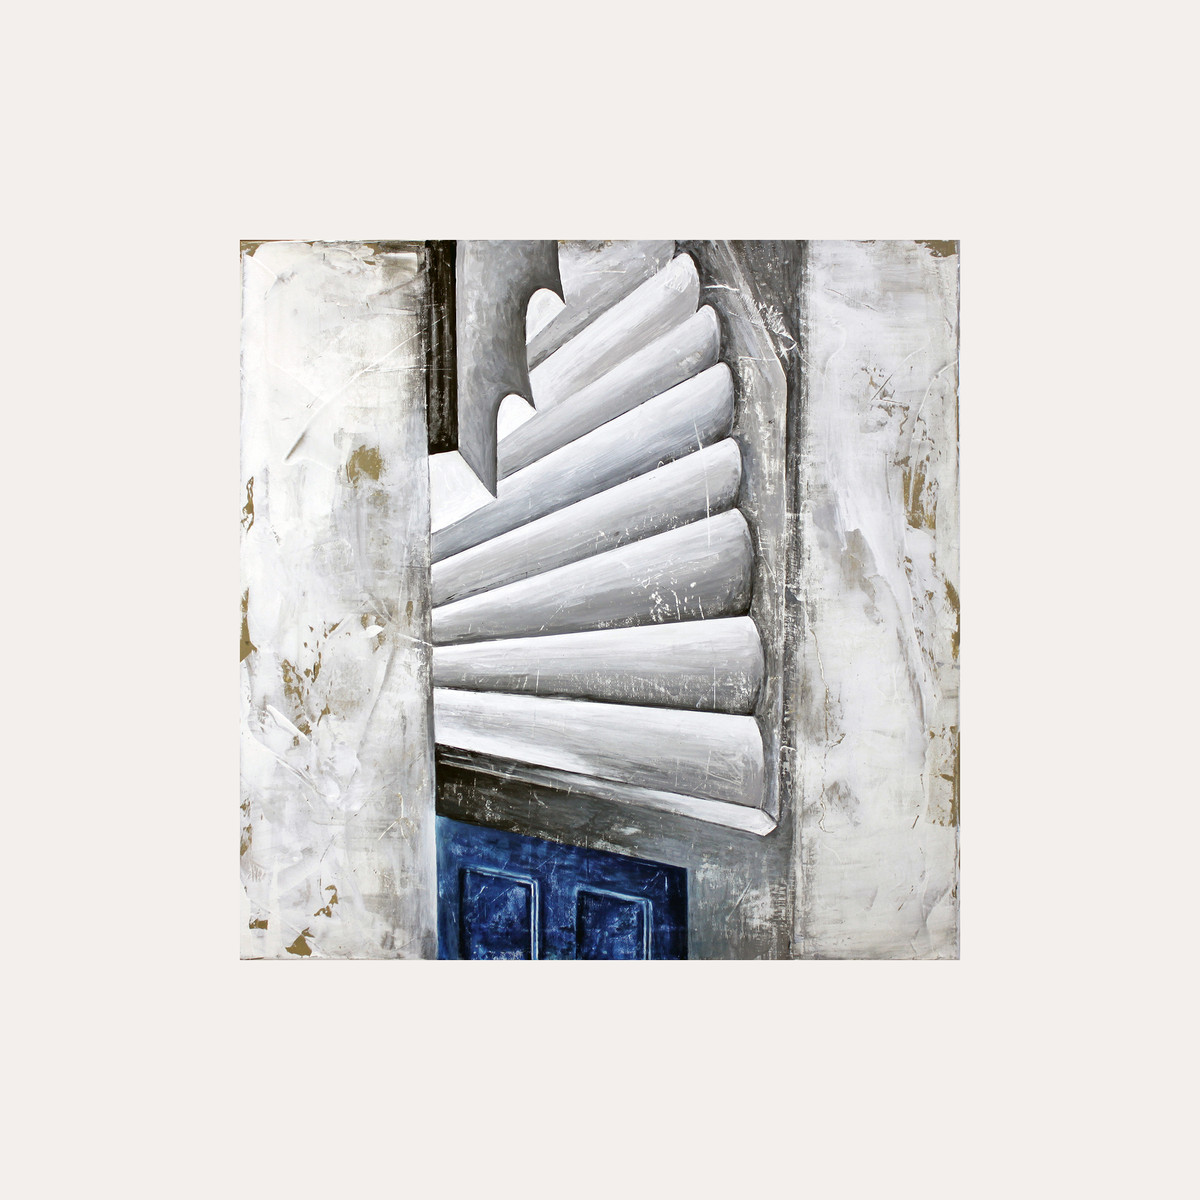 Mediterranean Details_Arco de ventana